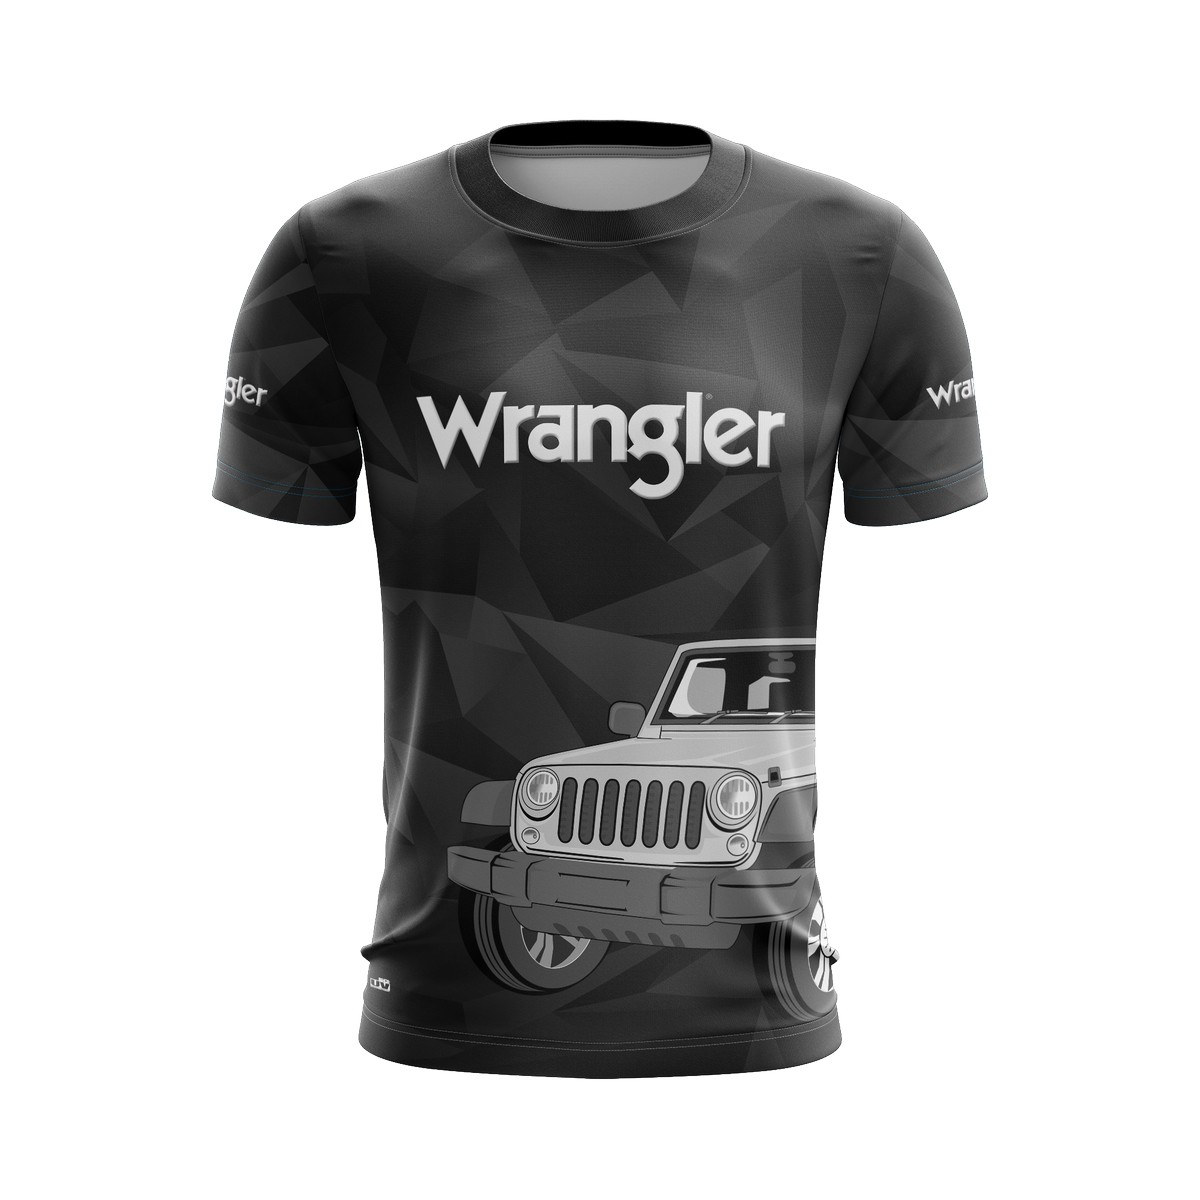 Camiseta Wrangler Casual 02 Brk Off Road Tecido Dry